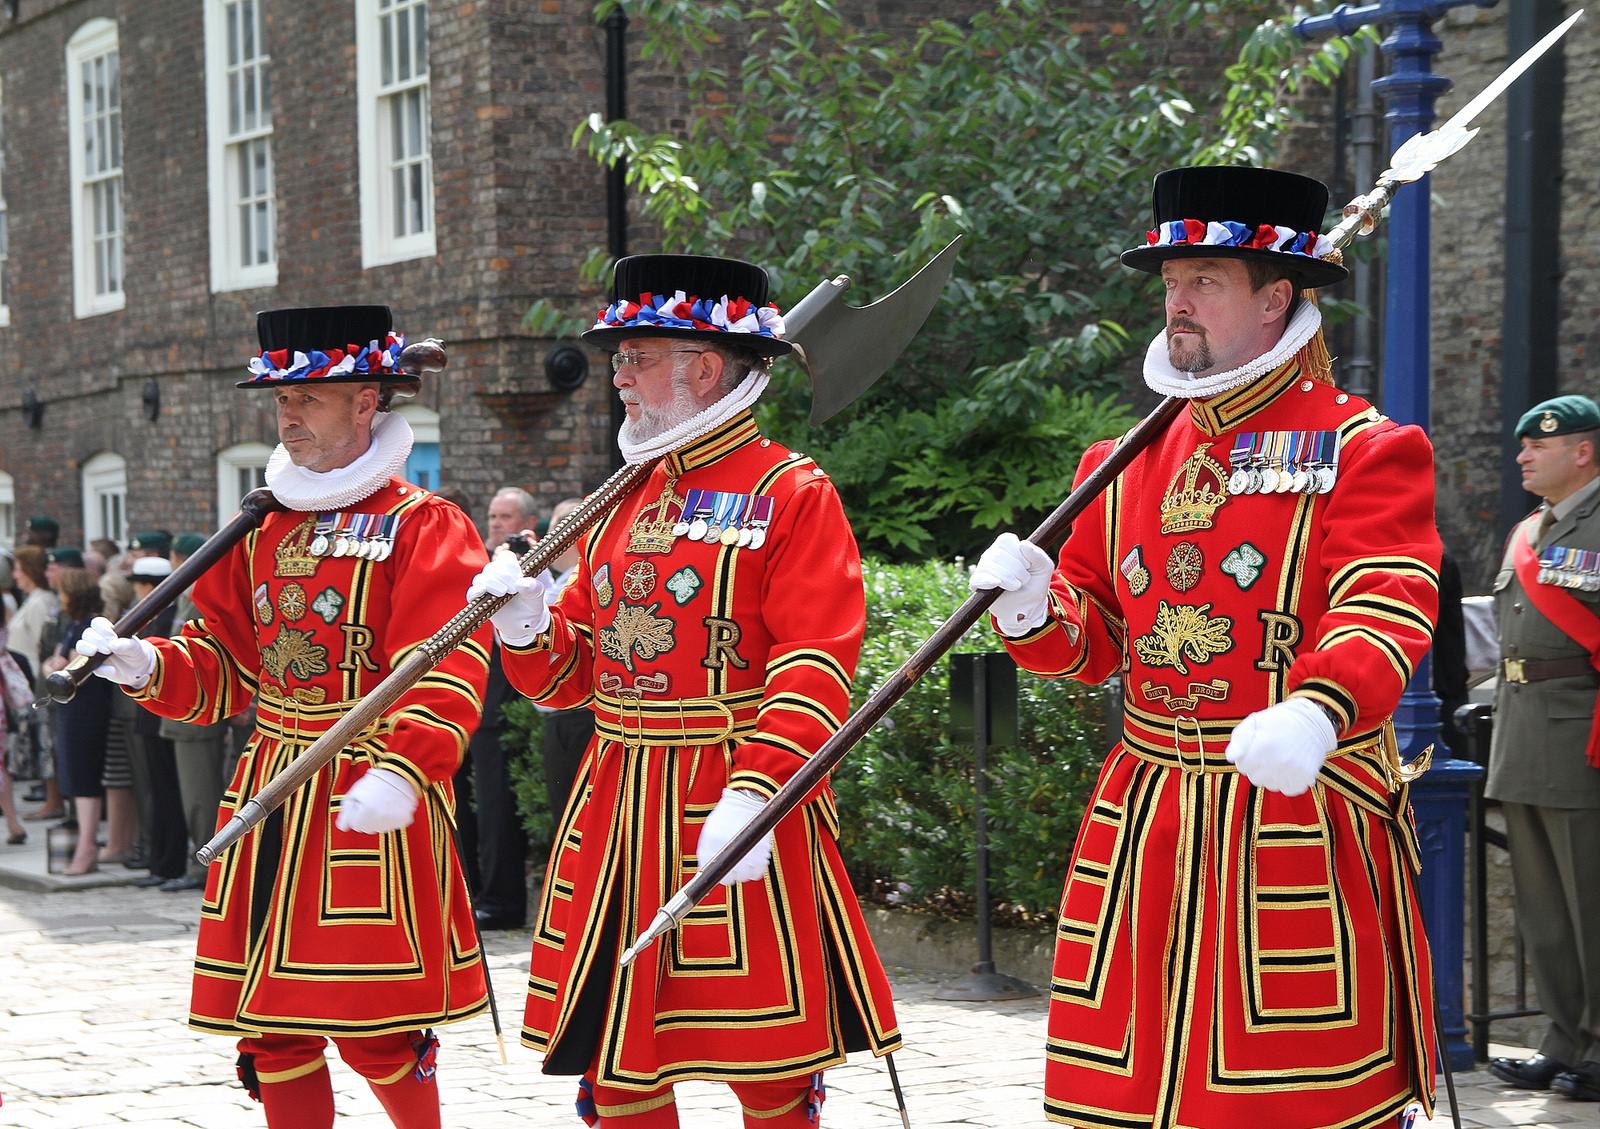 British Royal Mint Tour